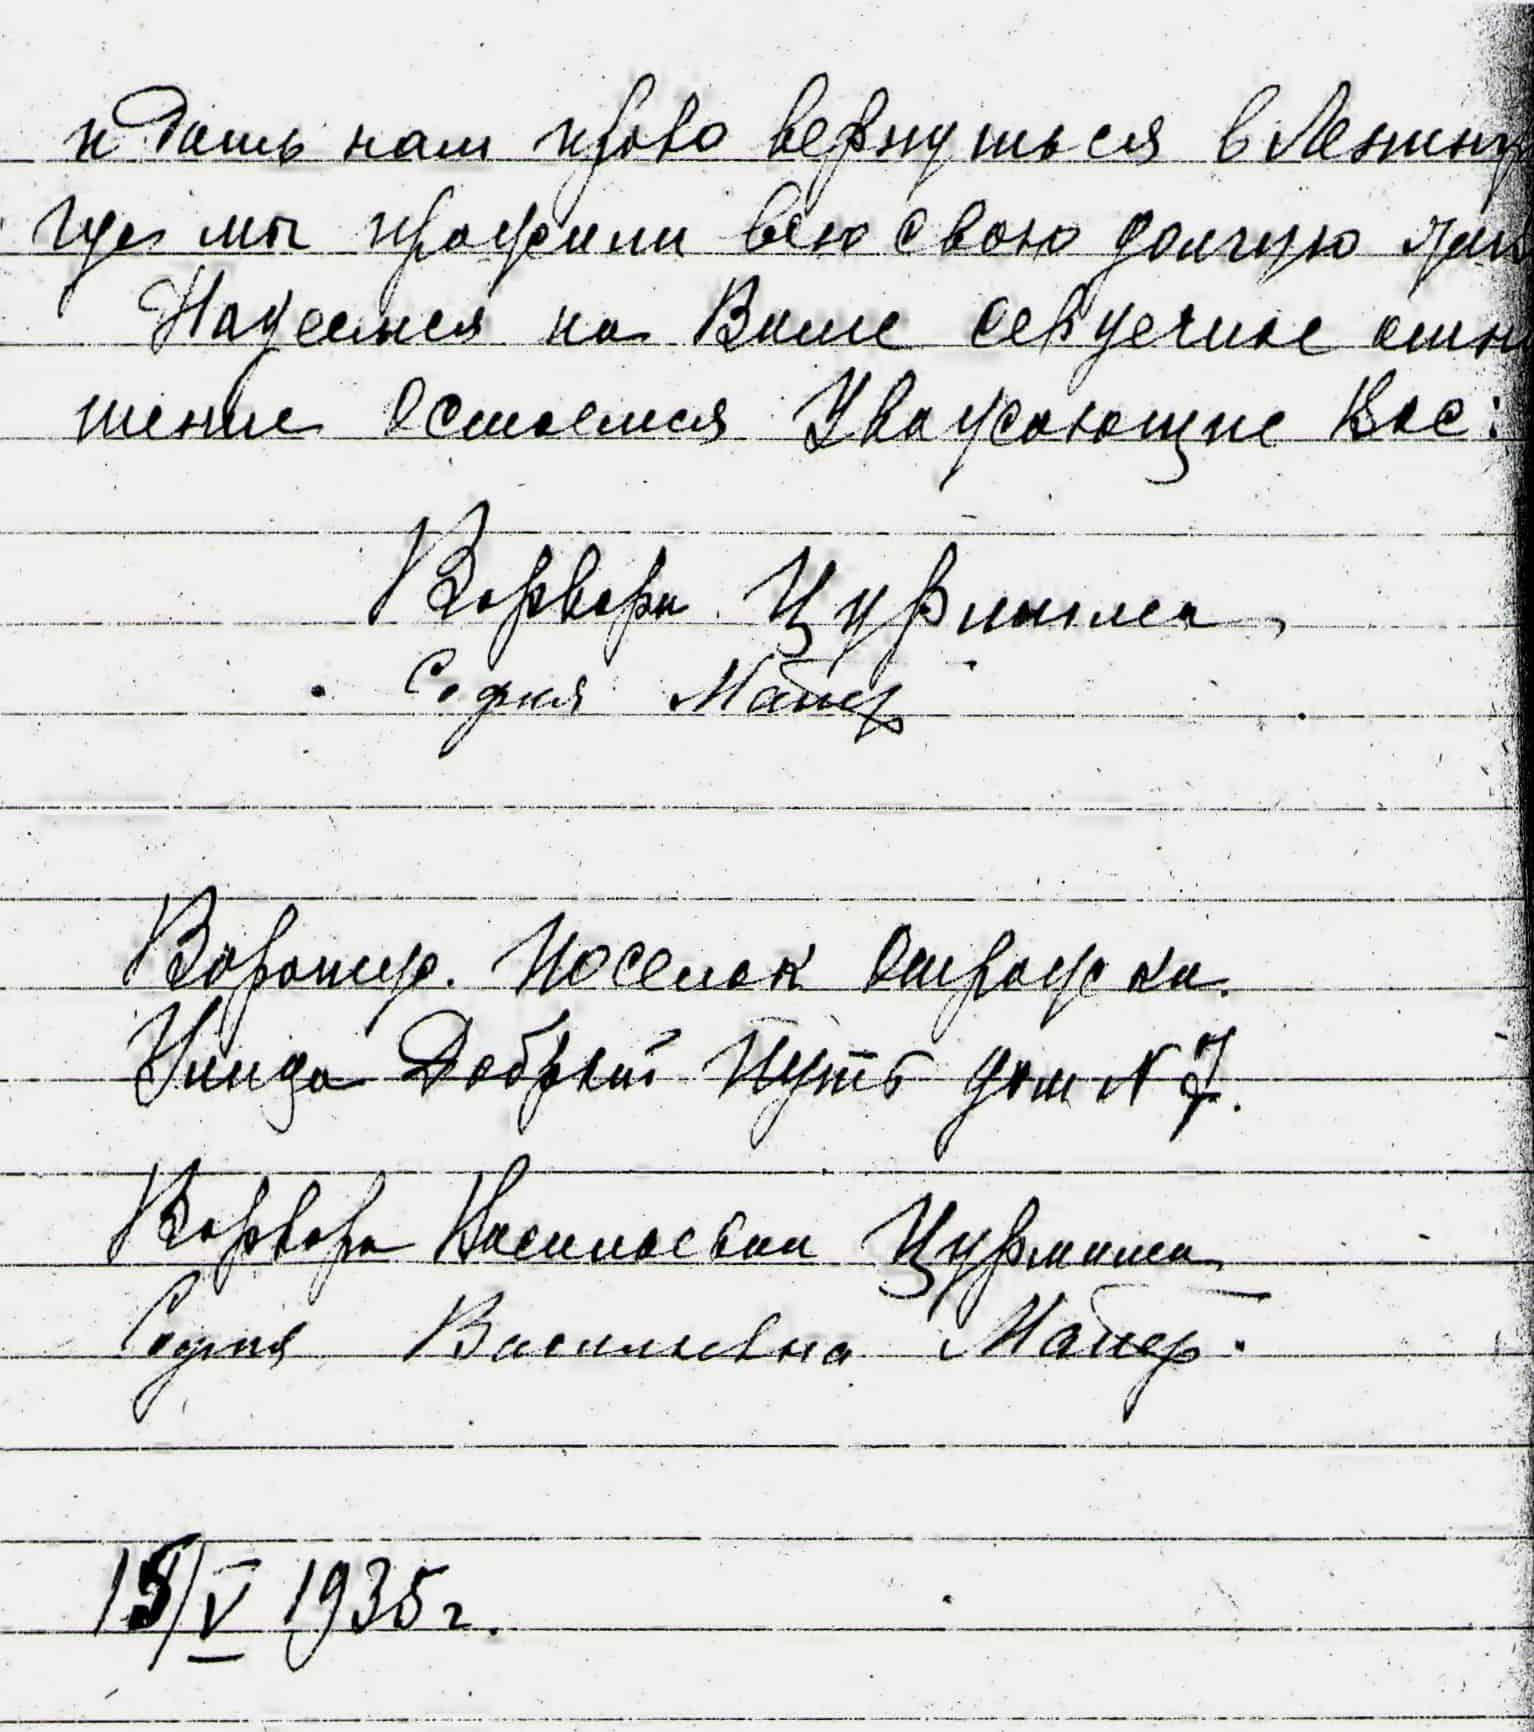 письмо Варвары Цурмилен